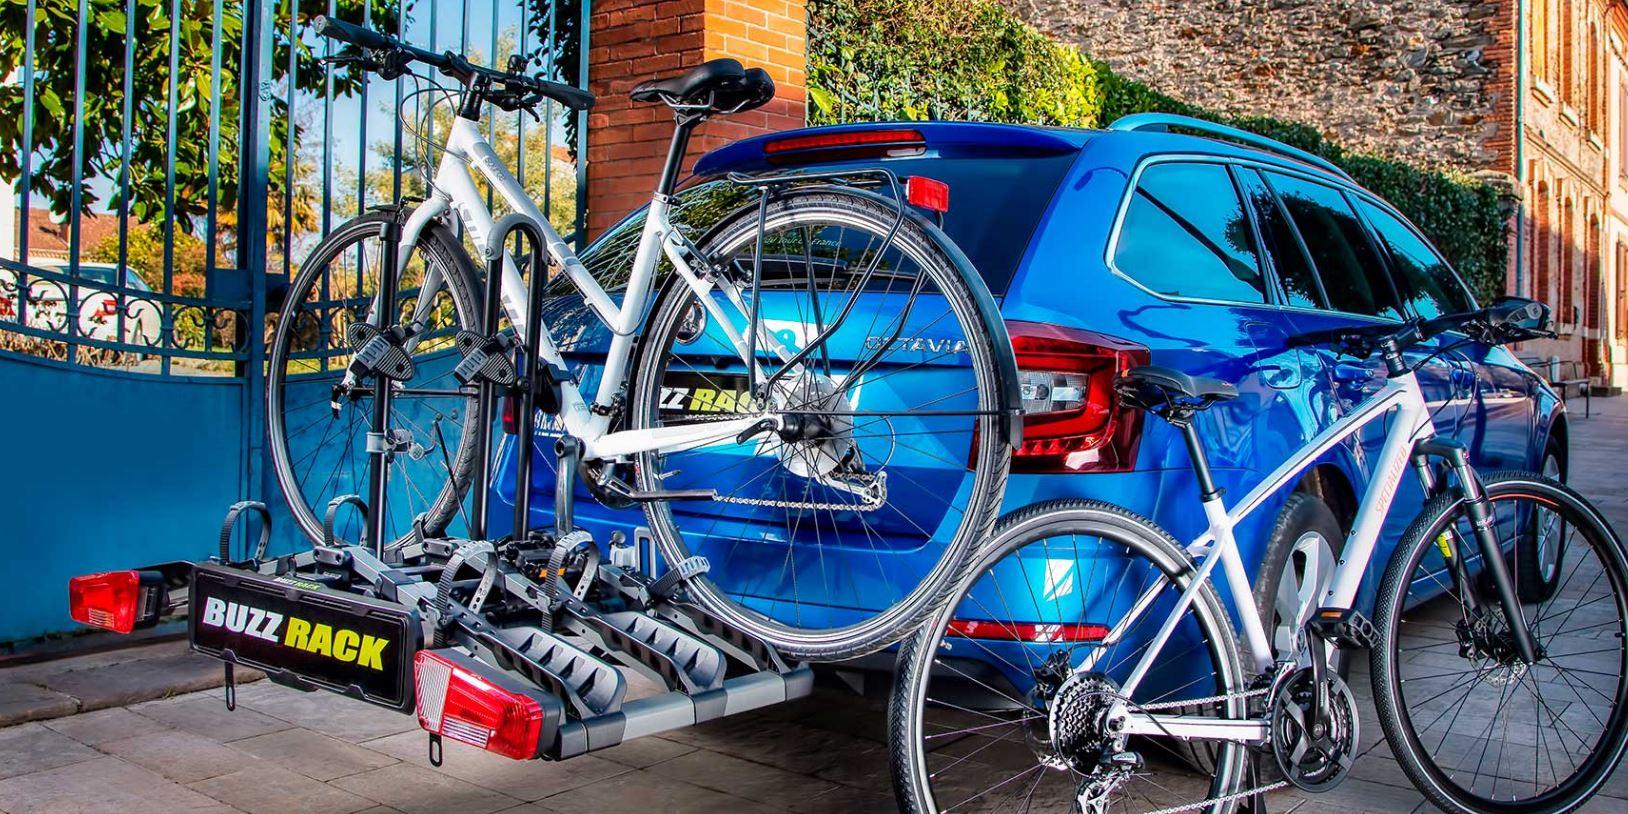 Buzzrack Eazzy Towball Mount Platform 3 Bike Carrier | Mr Cycling World